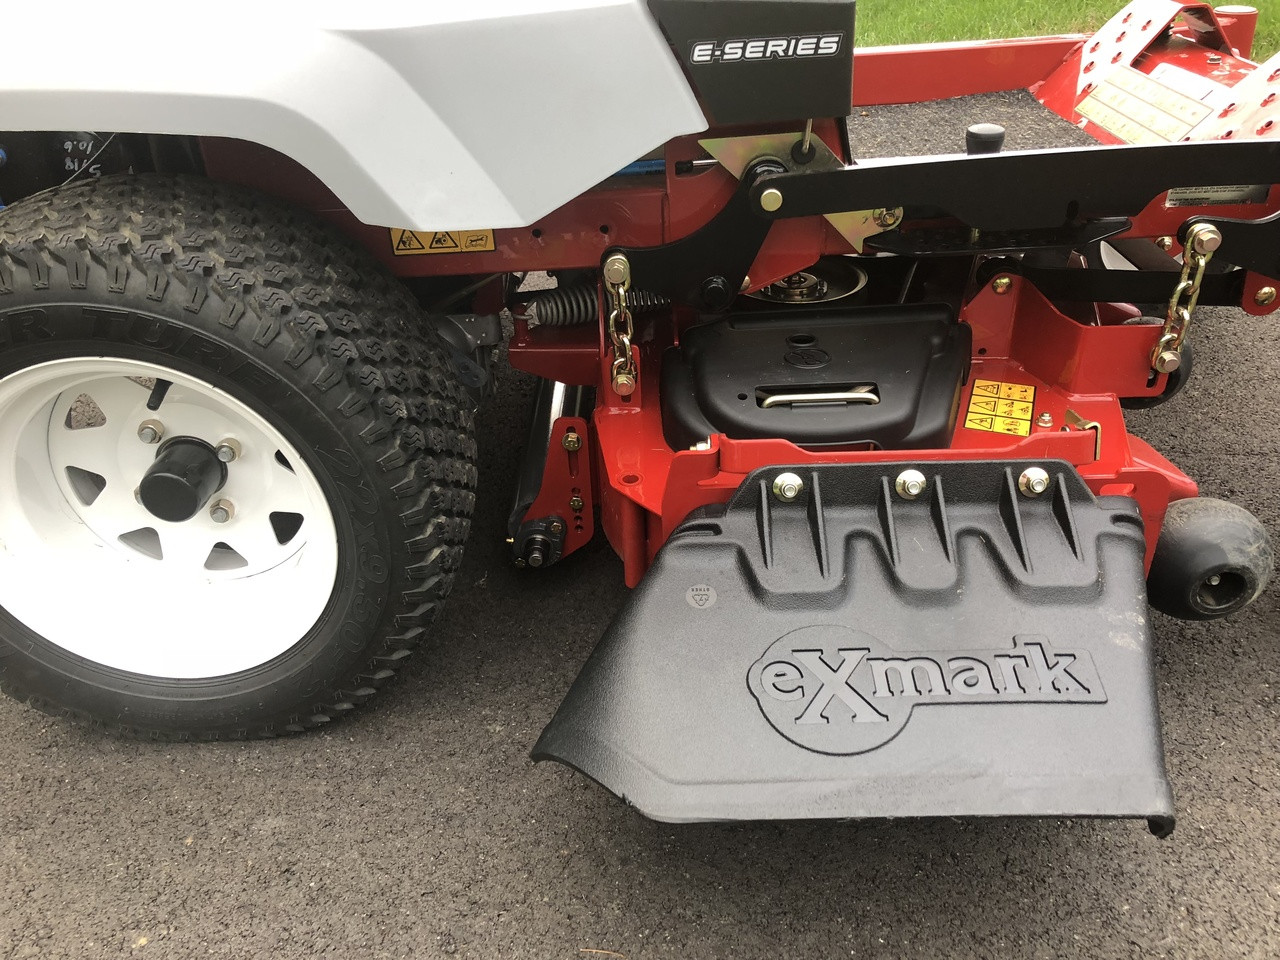 eXmark Radius lawn striping kit